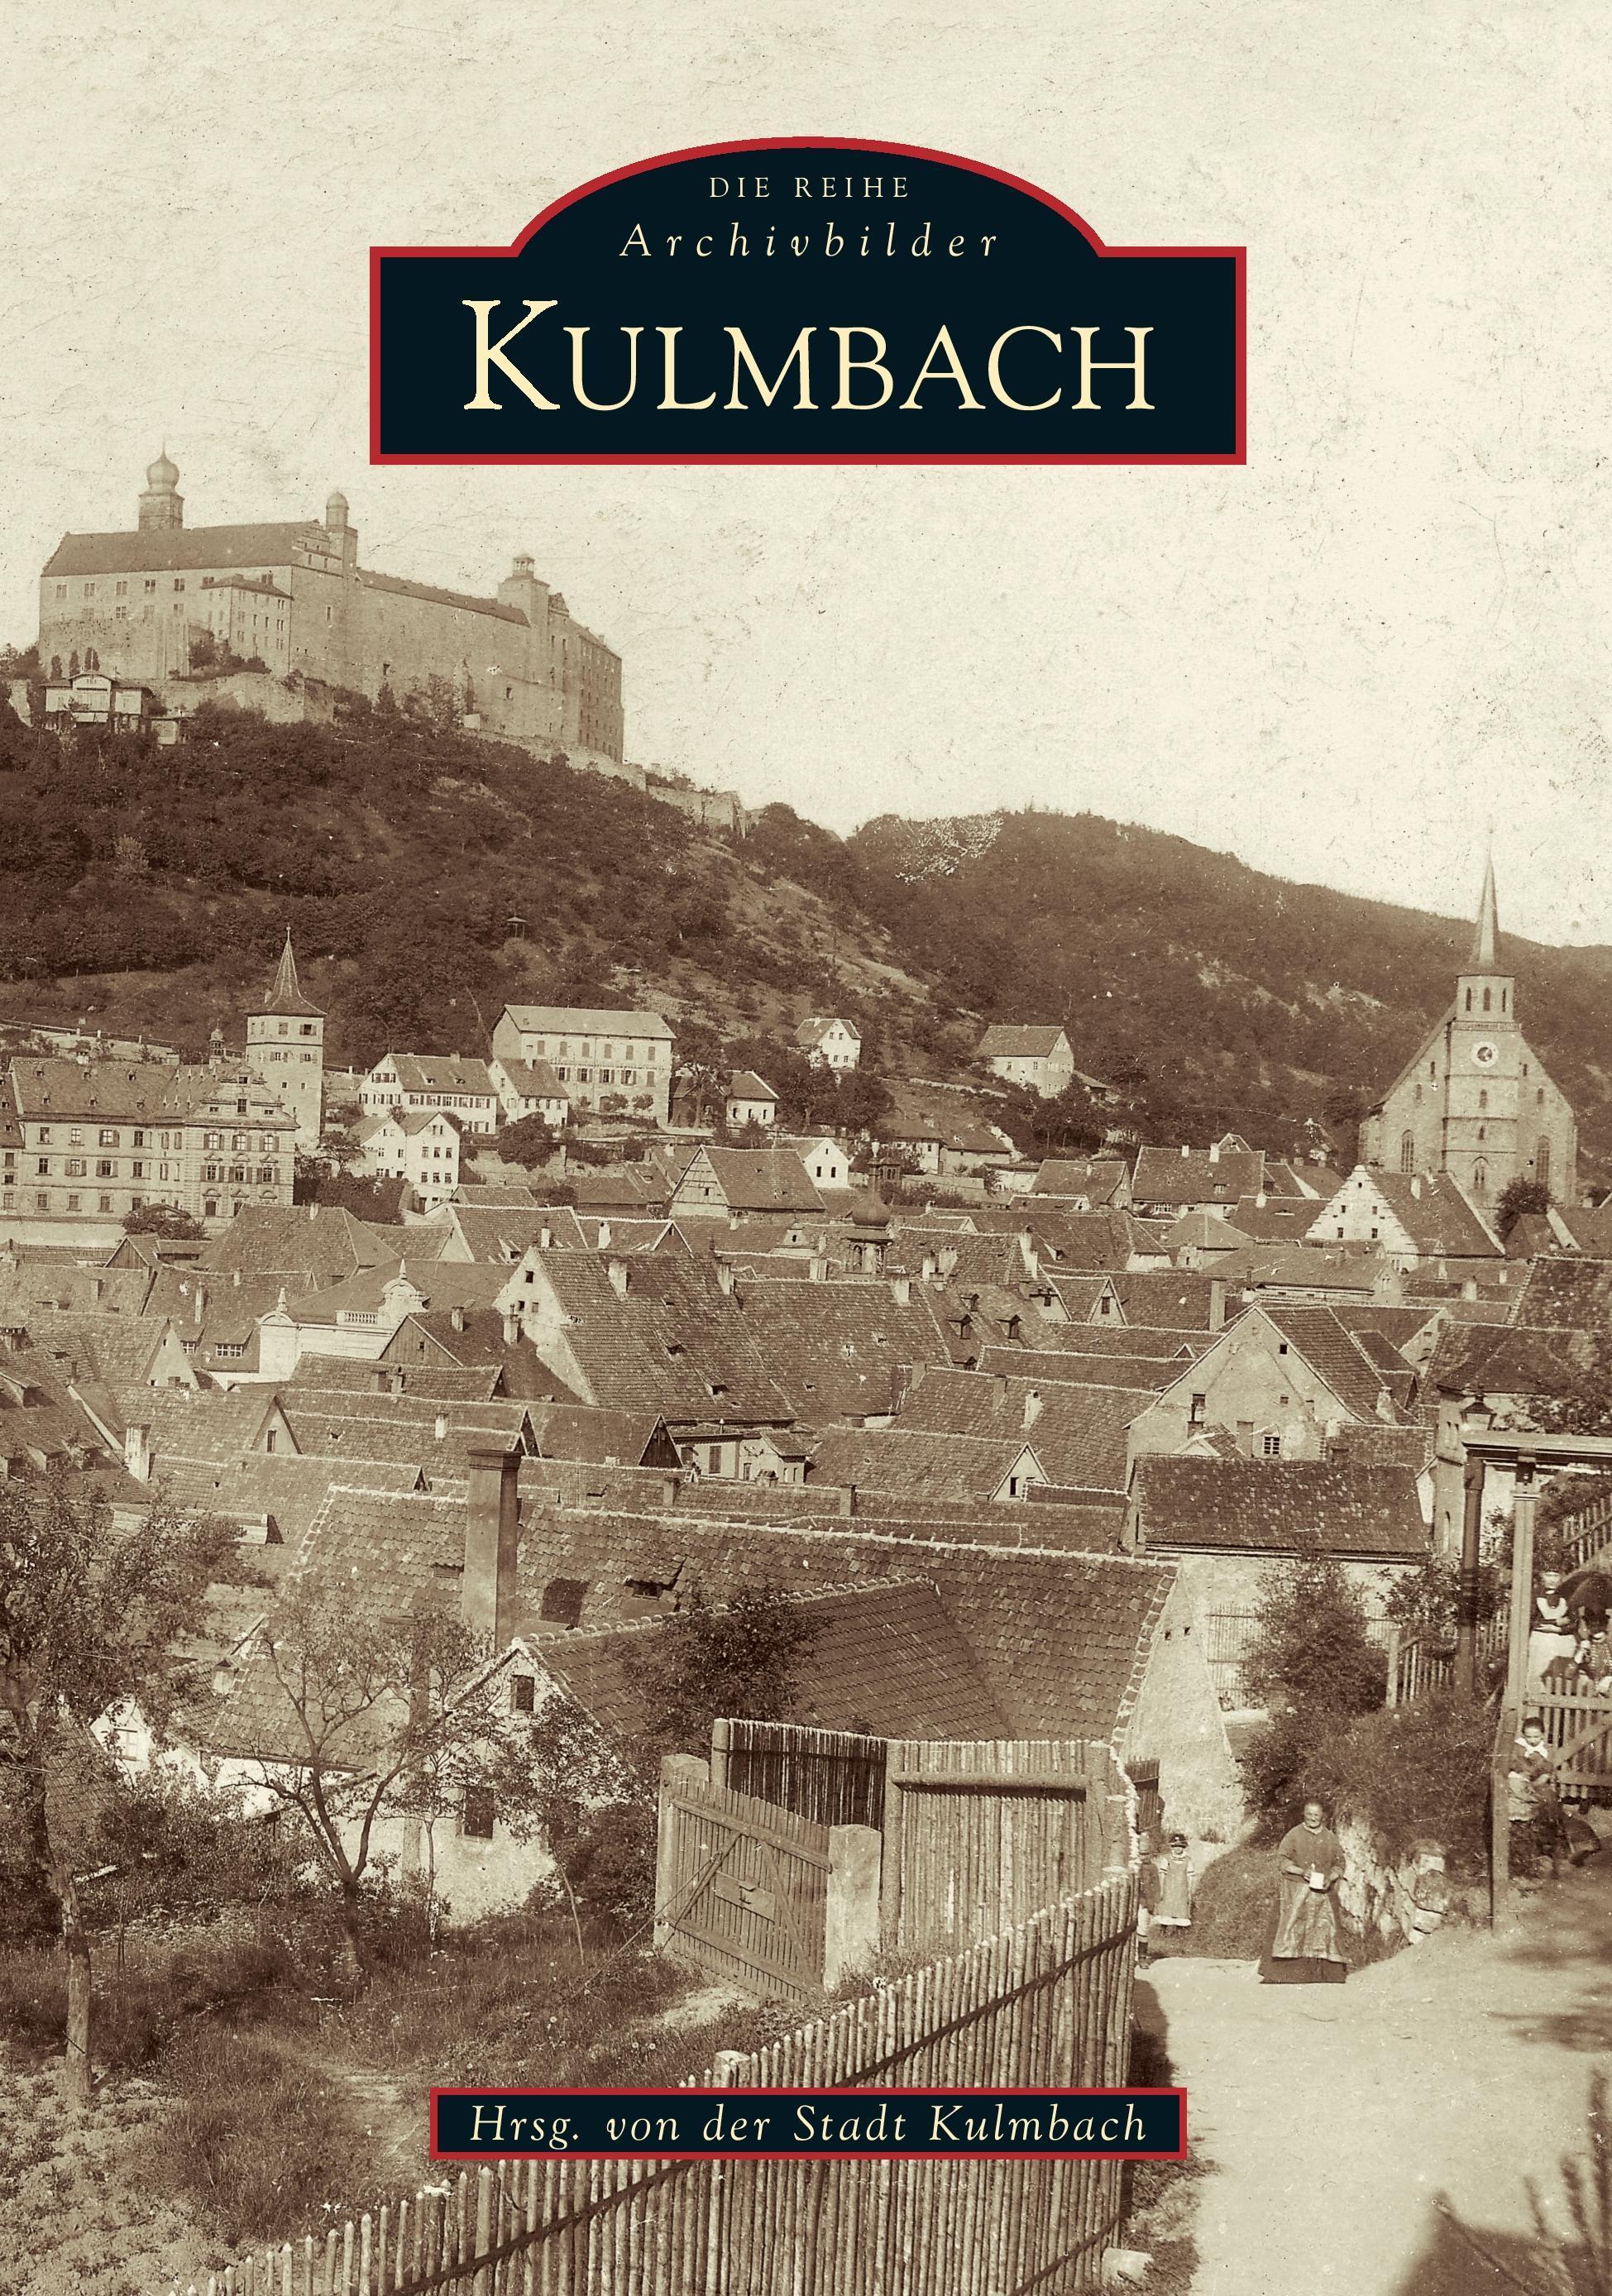 Kulmbach (Archivbilder) Hermann Müller